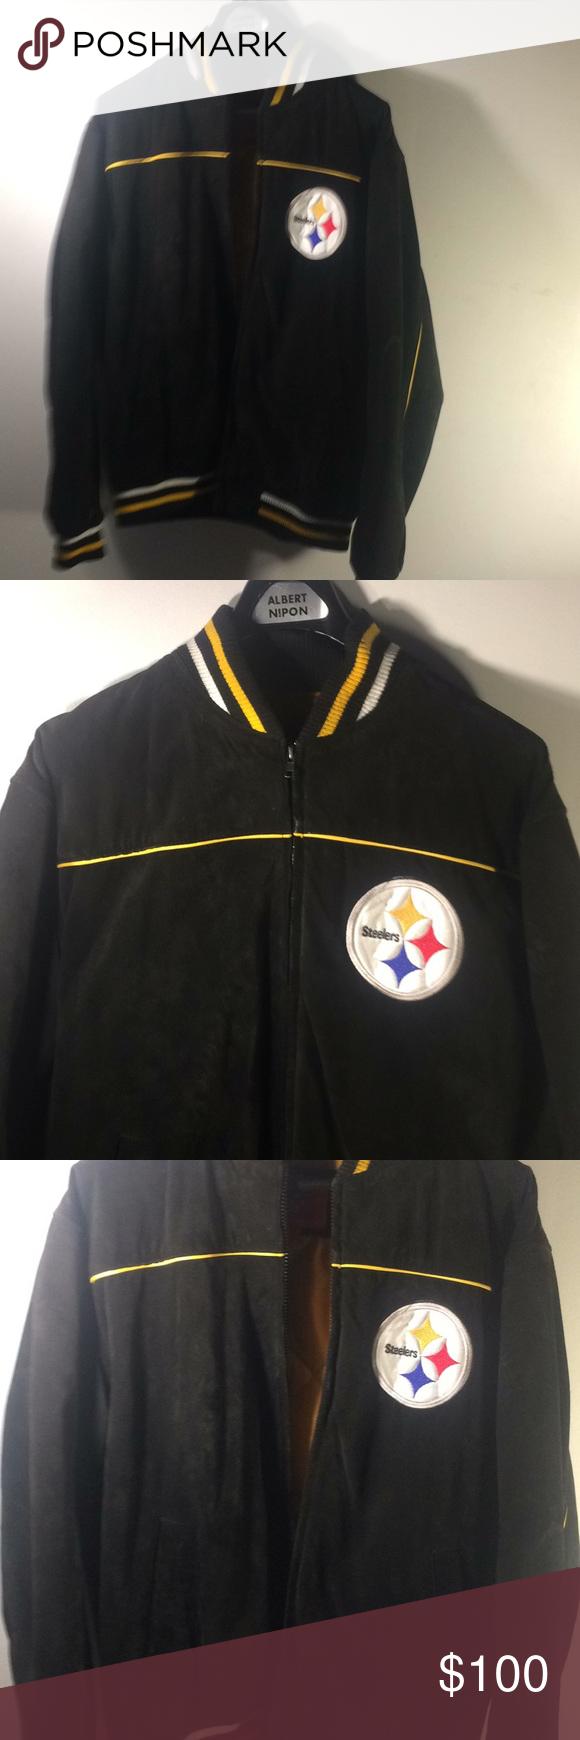 Men's large Pittsburgh Steeler starter jacket in 2020